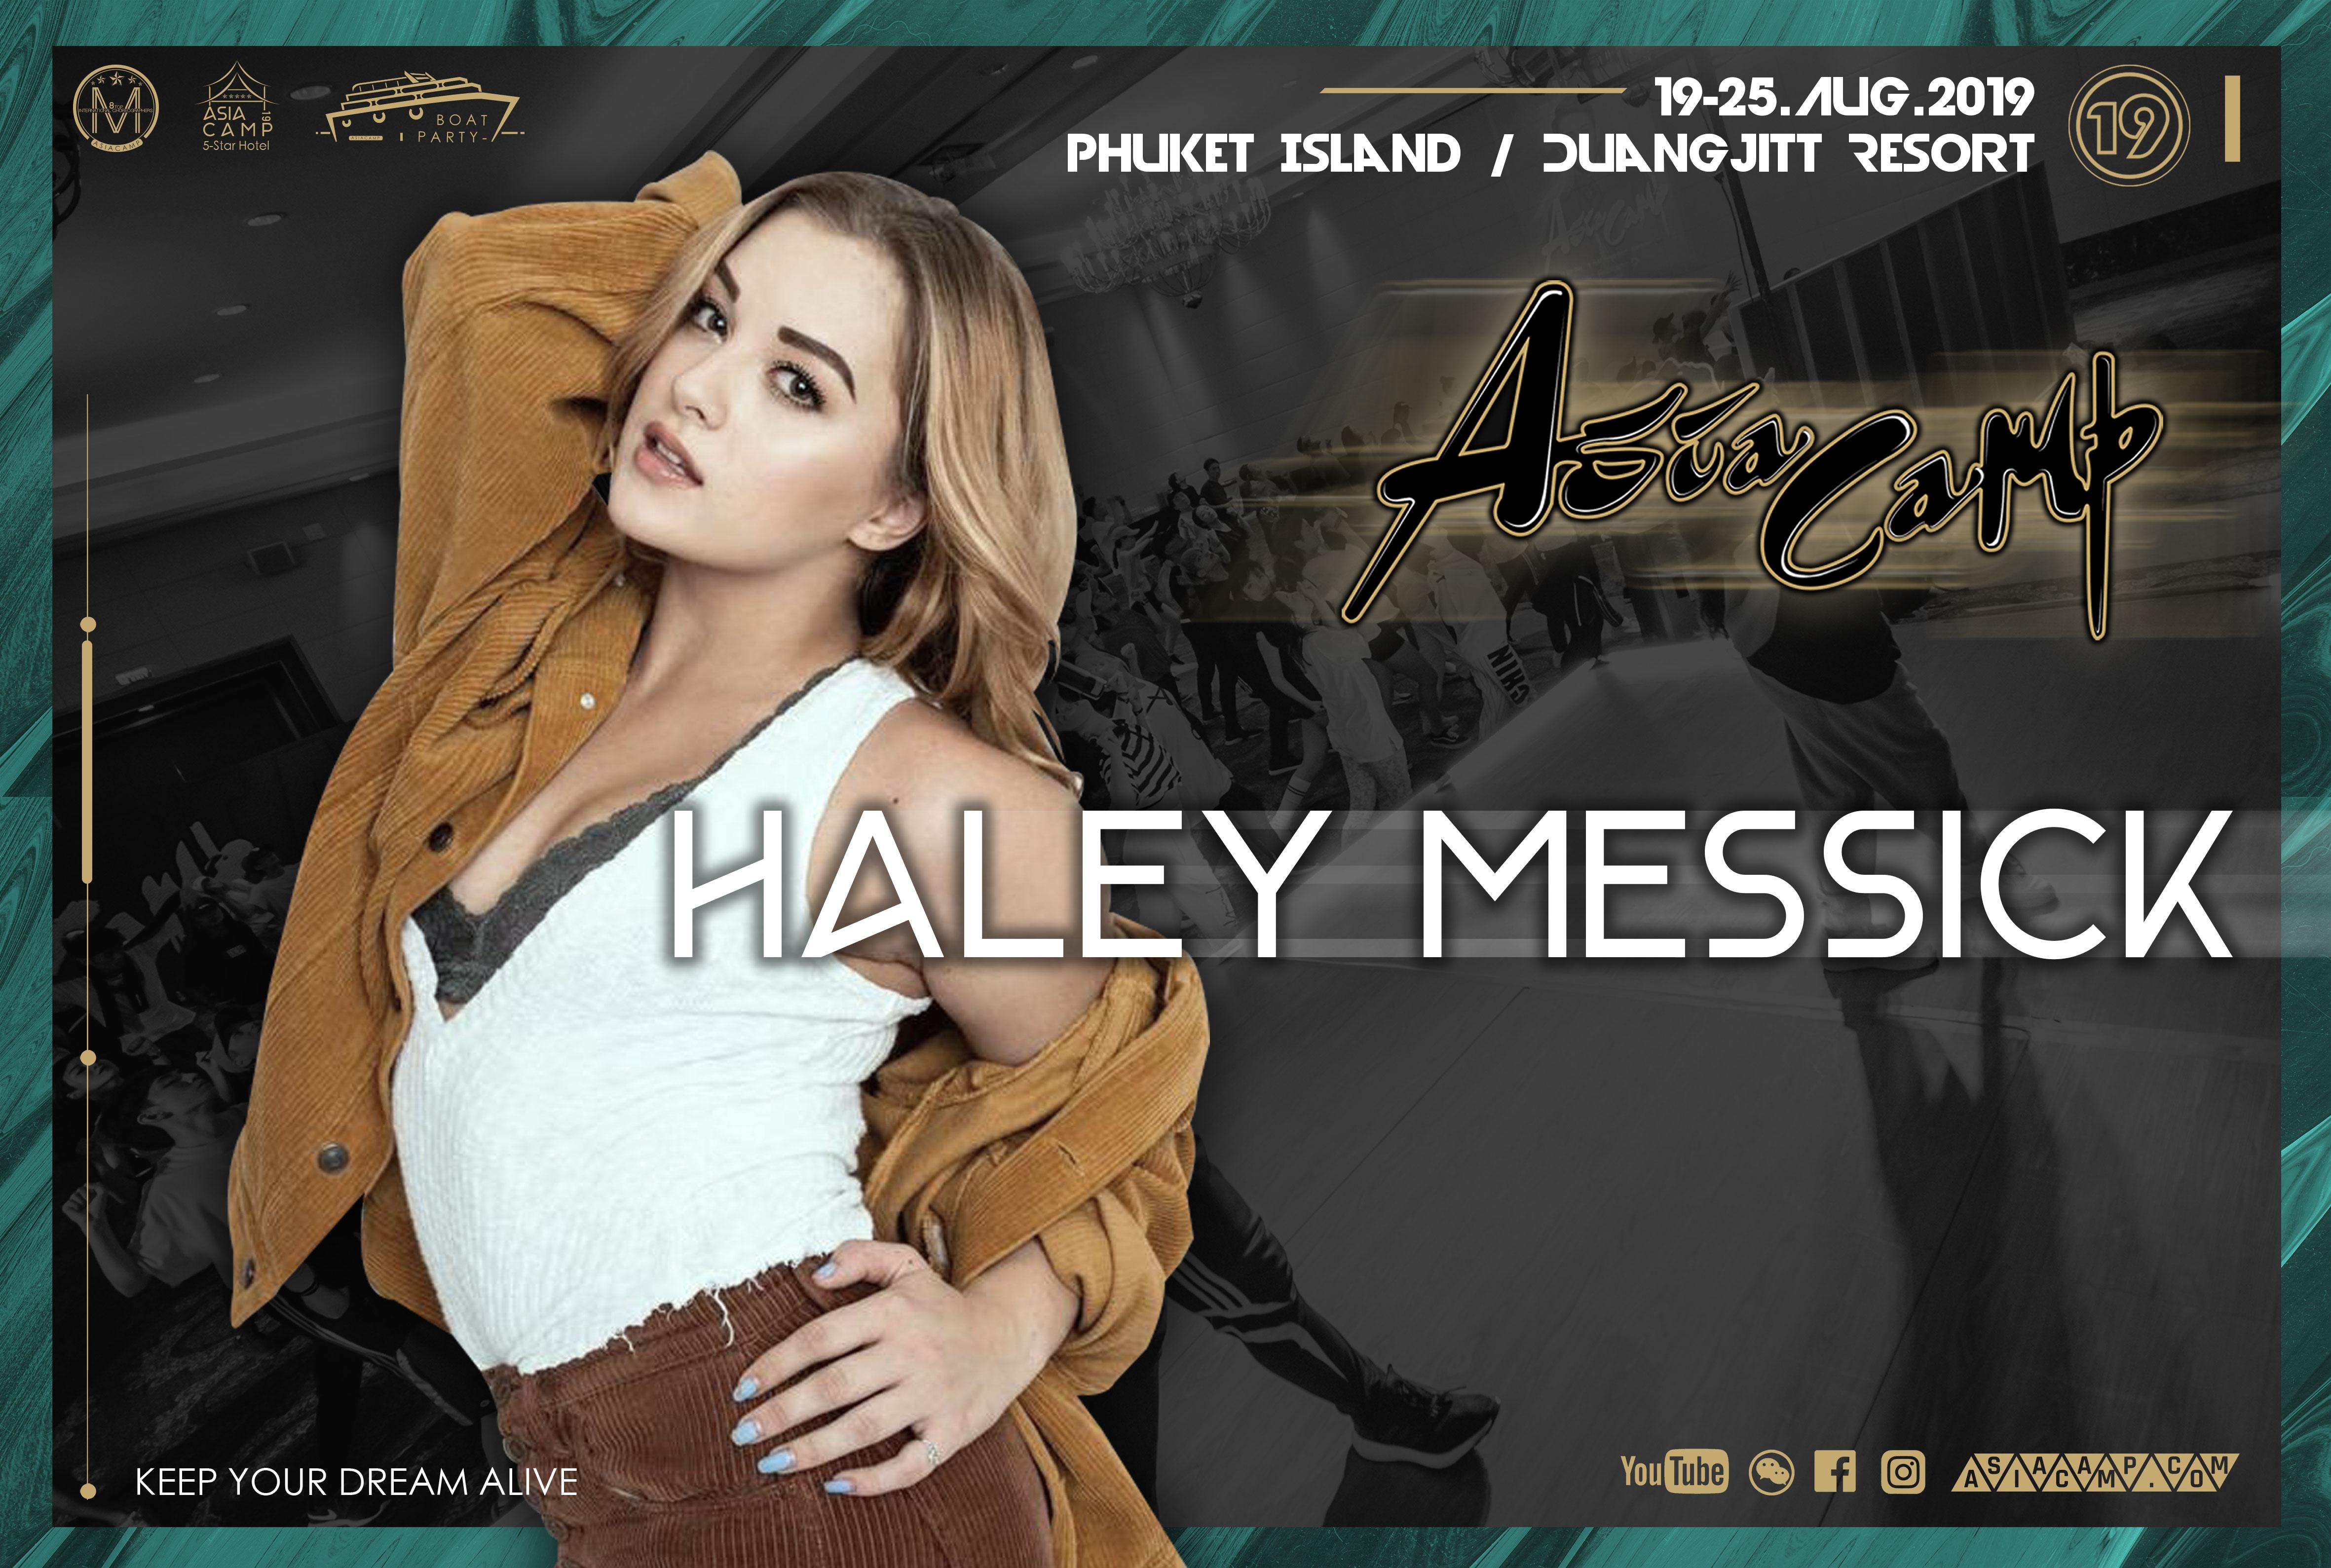 Hayley Messick